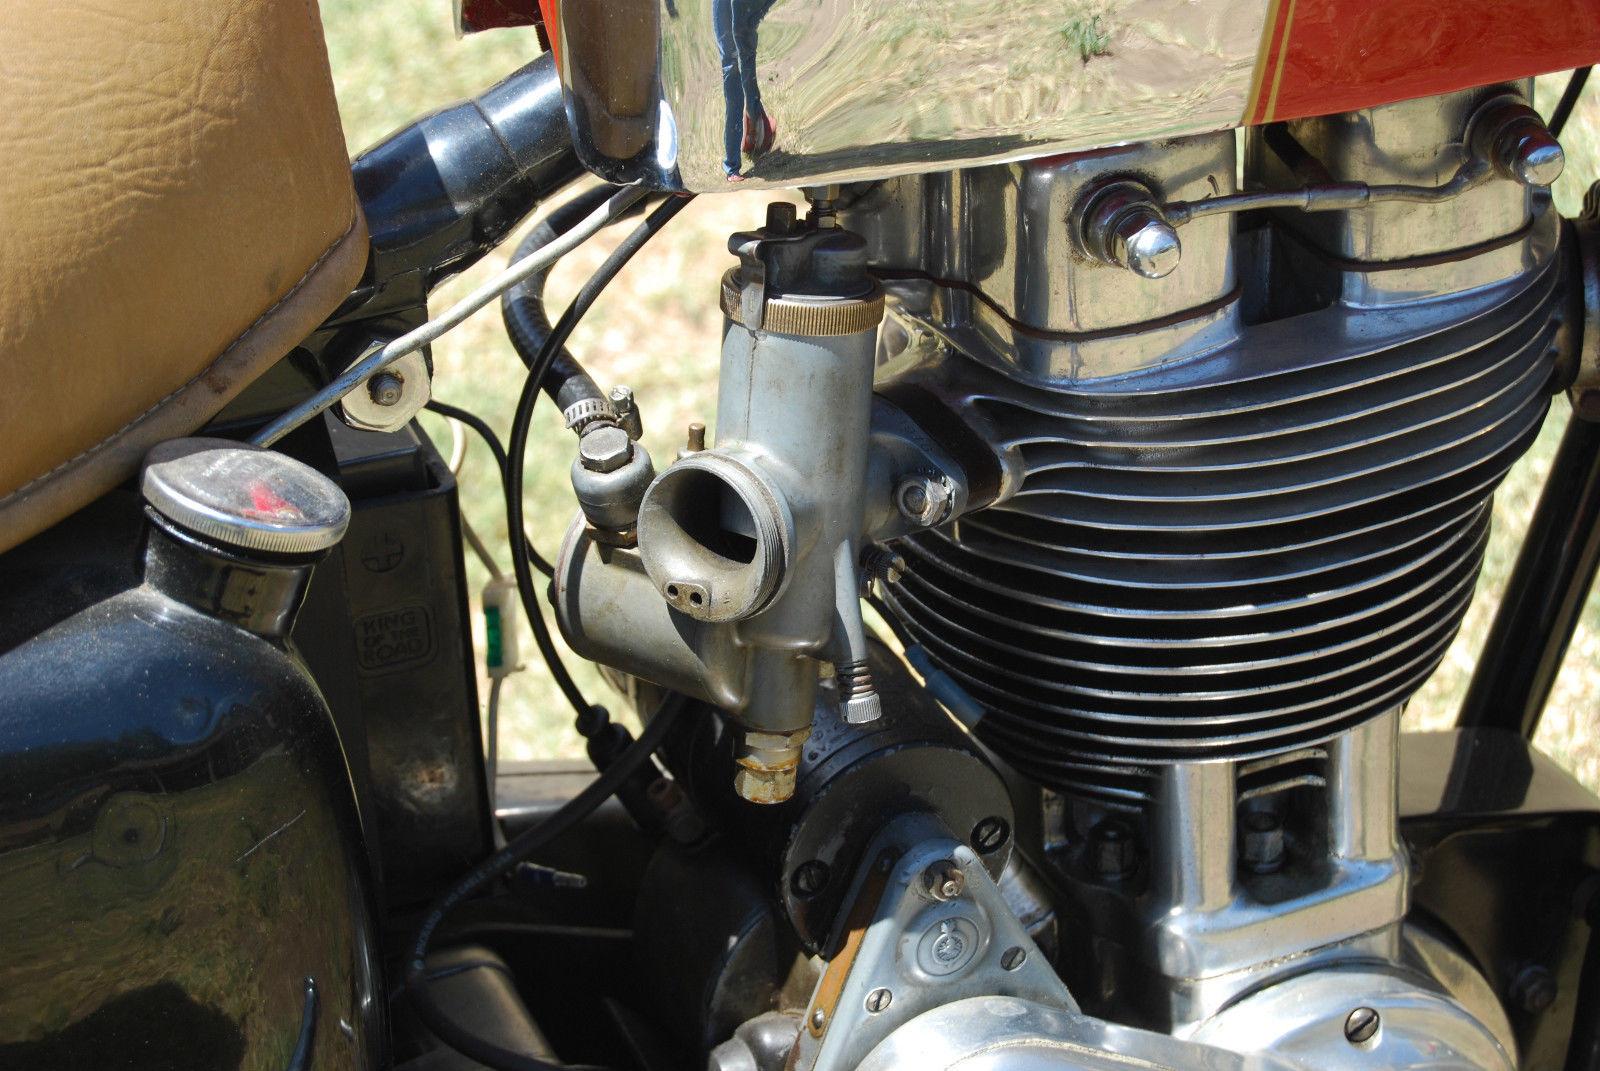 Ariel HS - 1957 - Carburettor, Slide, Choke, Jets and Float.